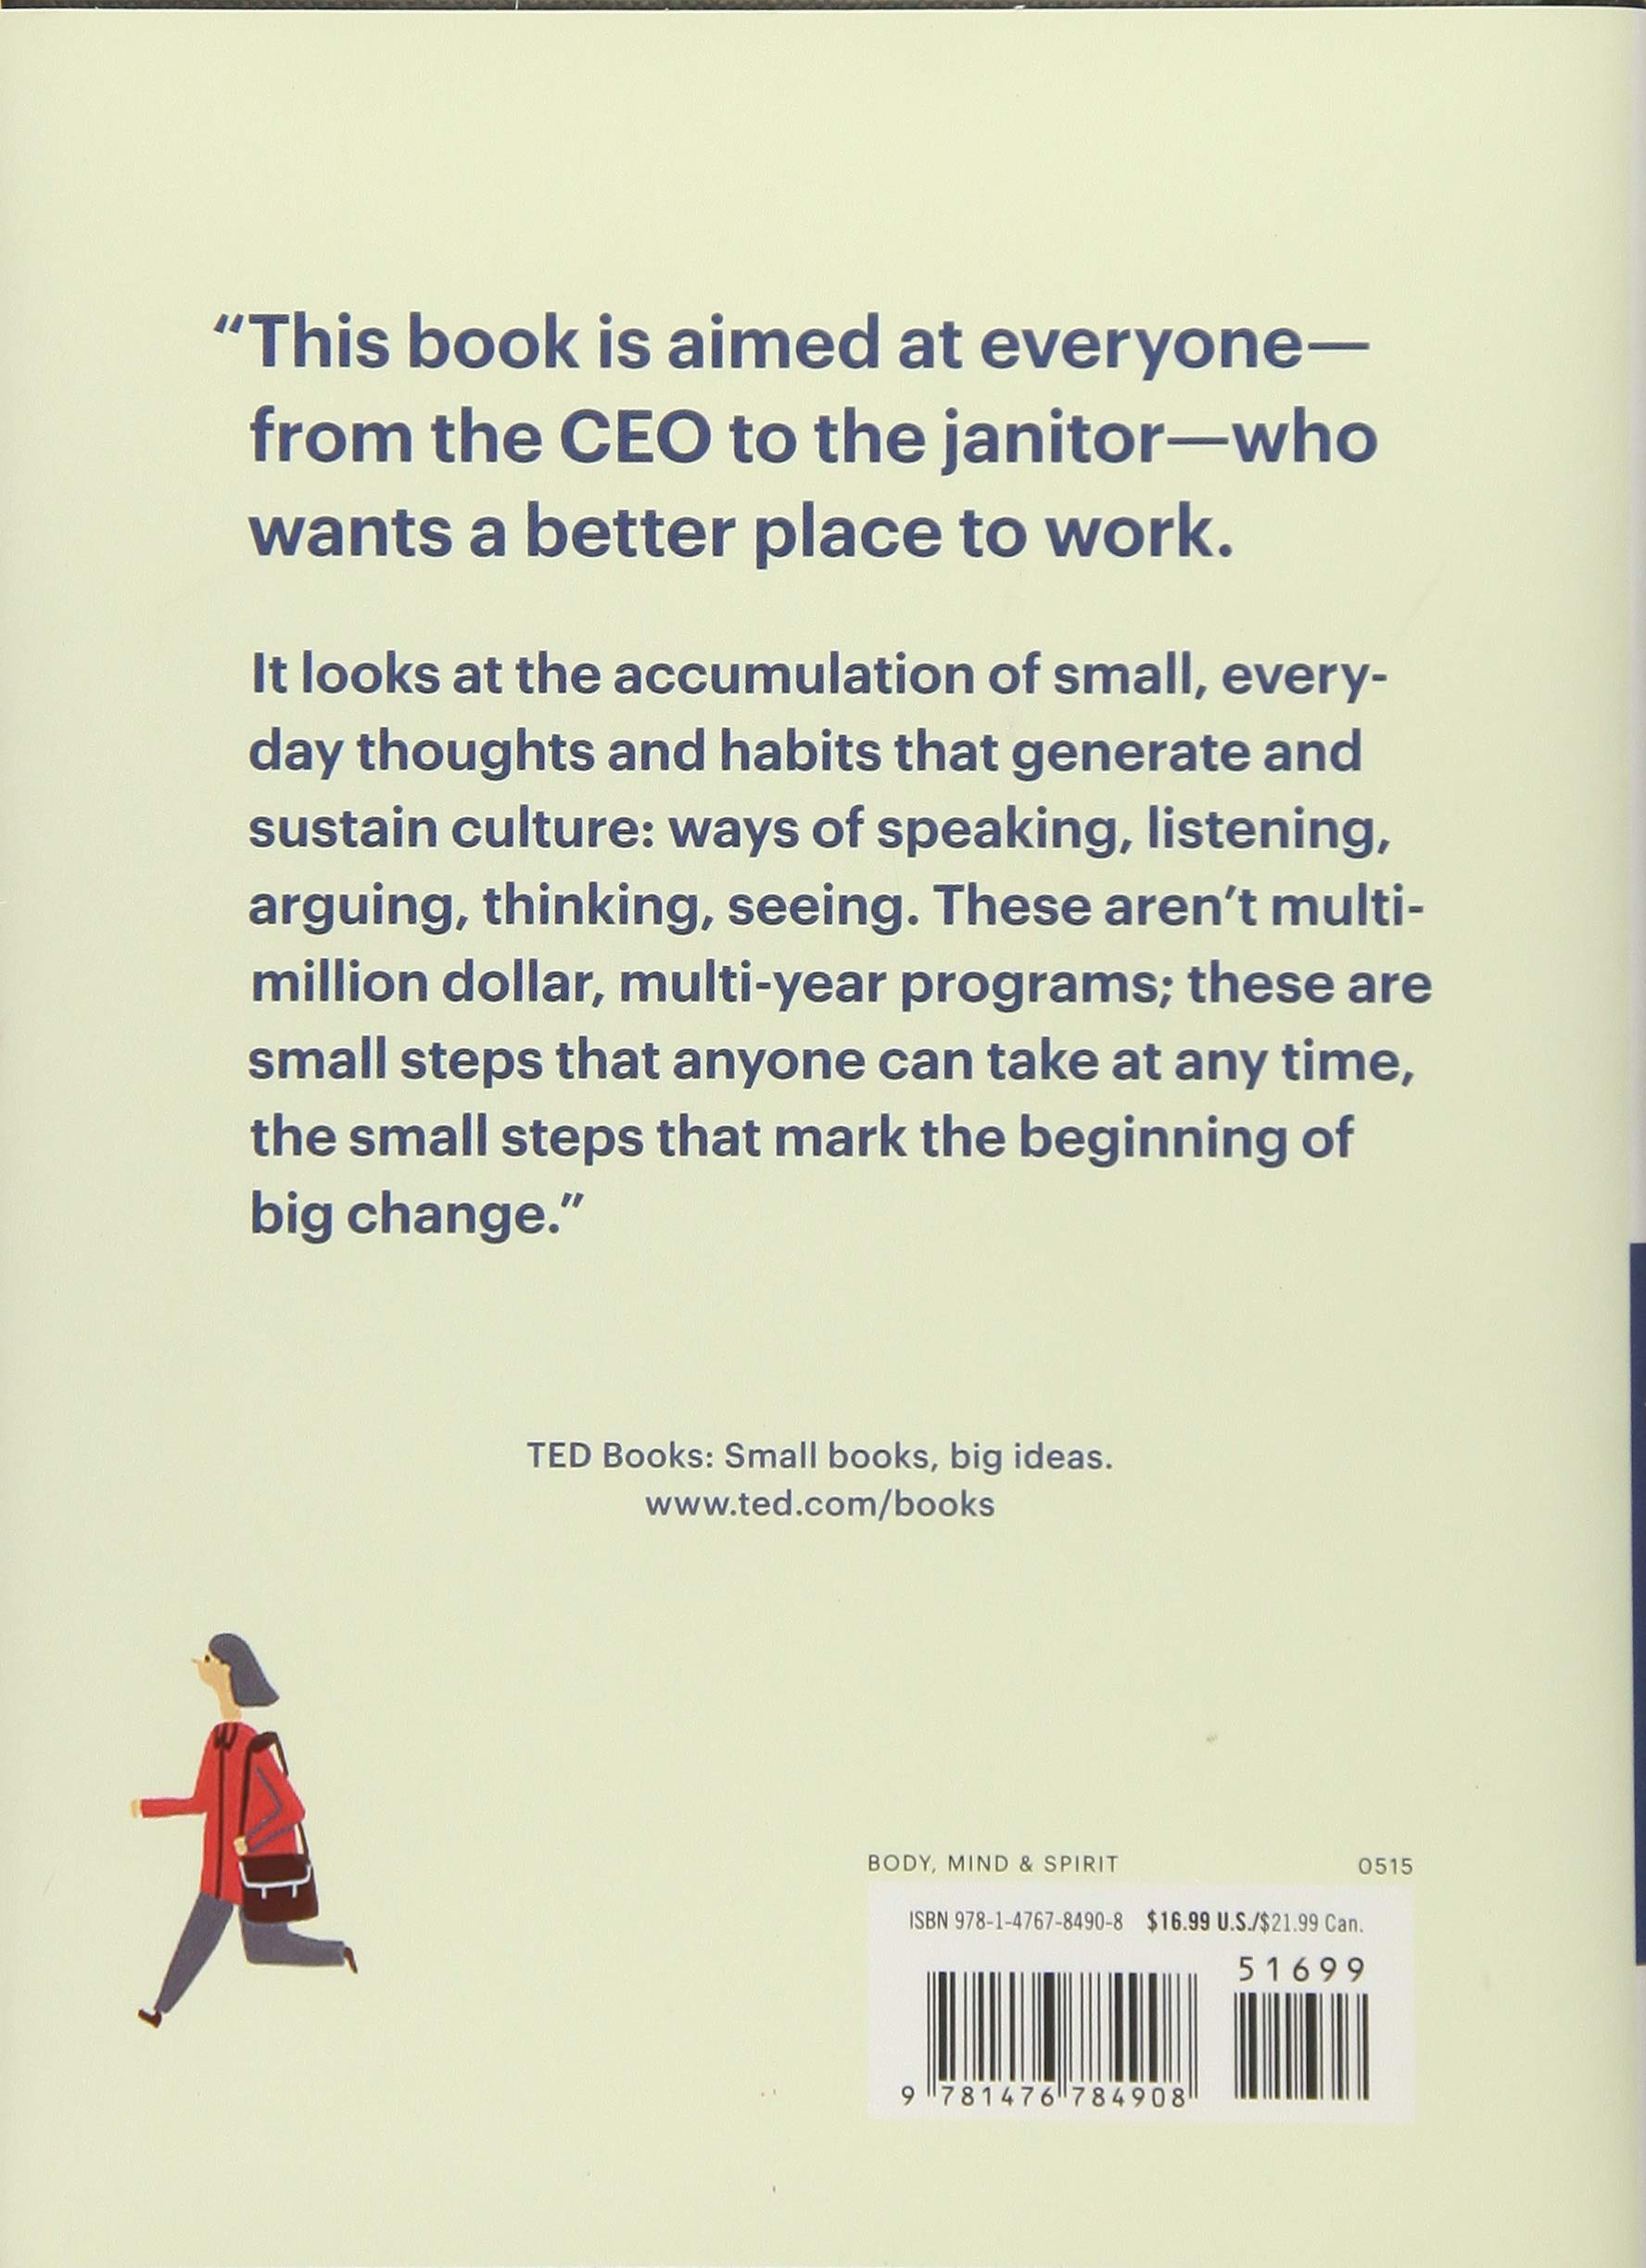 Beyond Measure: The Big Impact of Small Changes - Livros na Amazon Brasil-  9781476784908